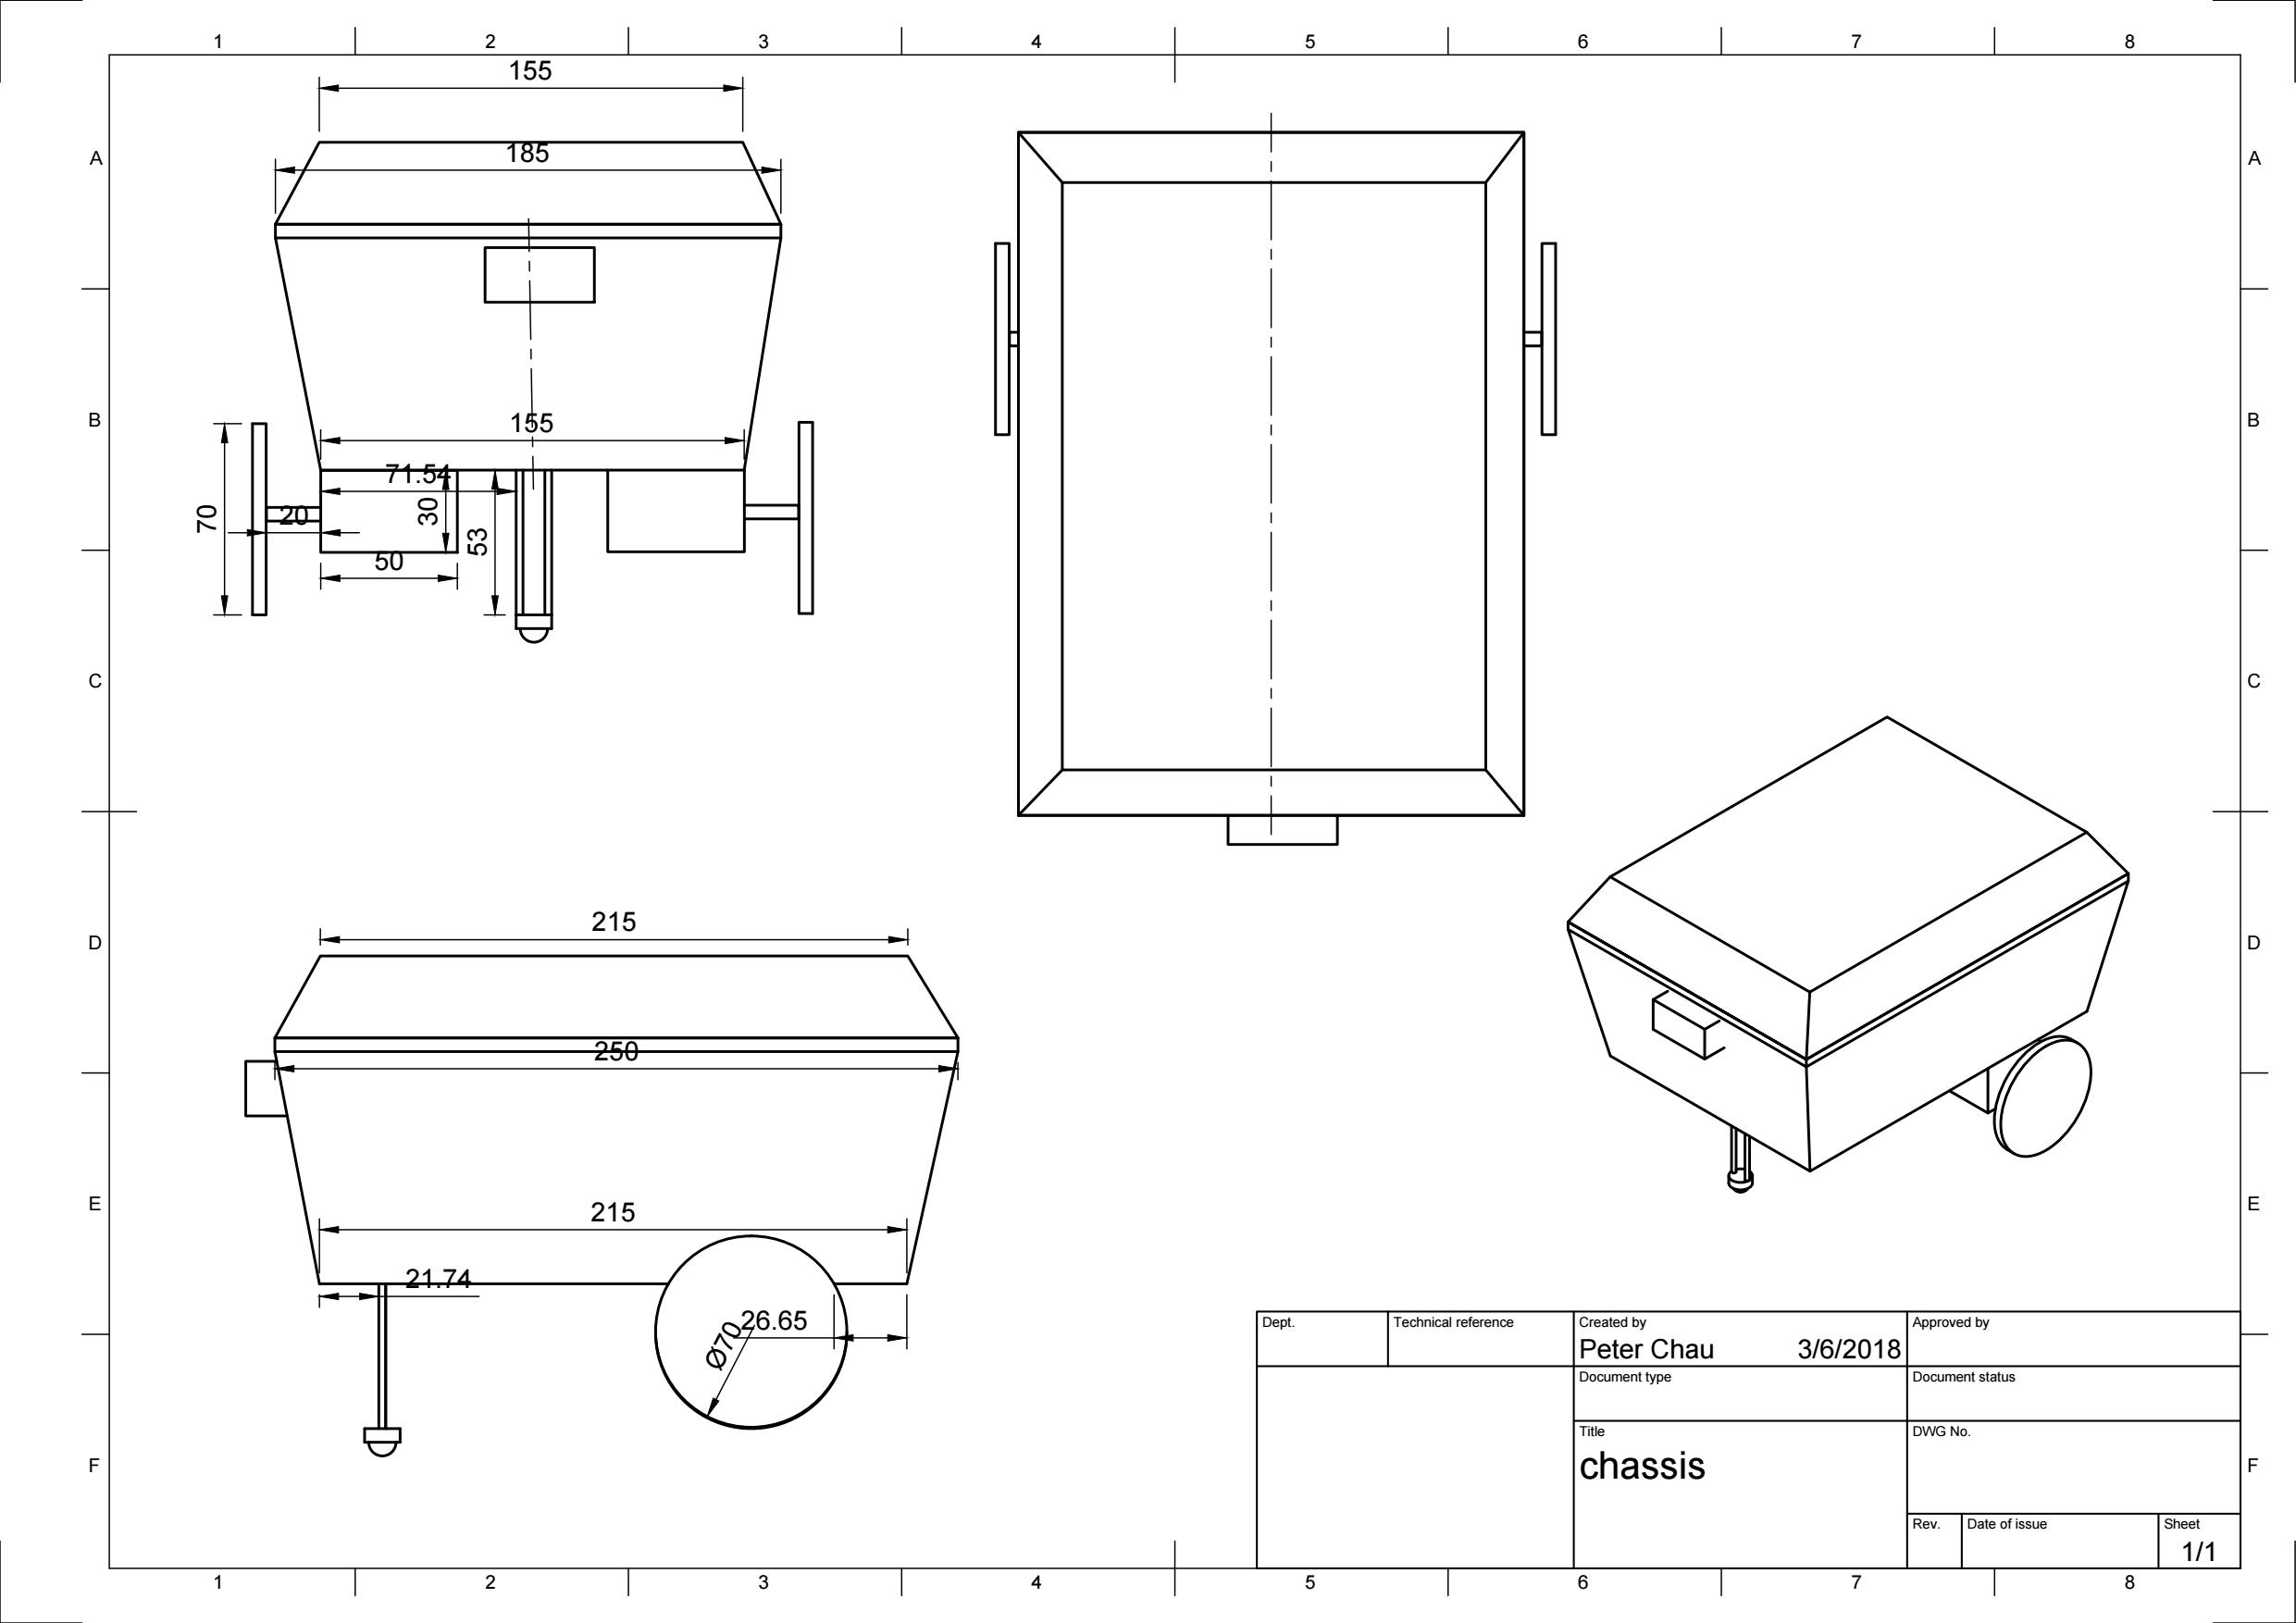 Fusion 360 Drawing of Chefbot